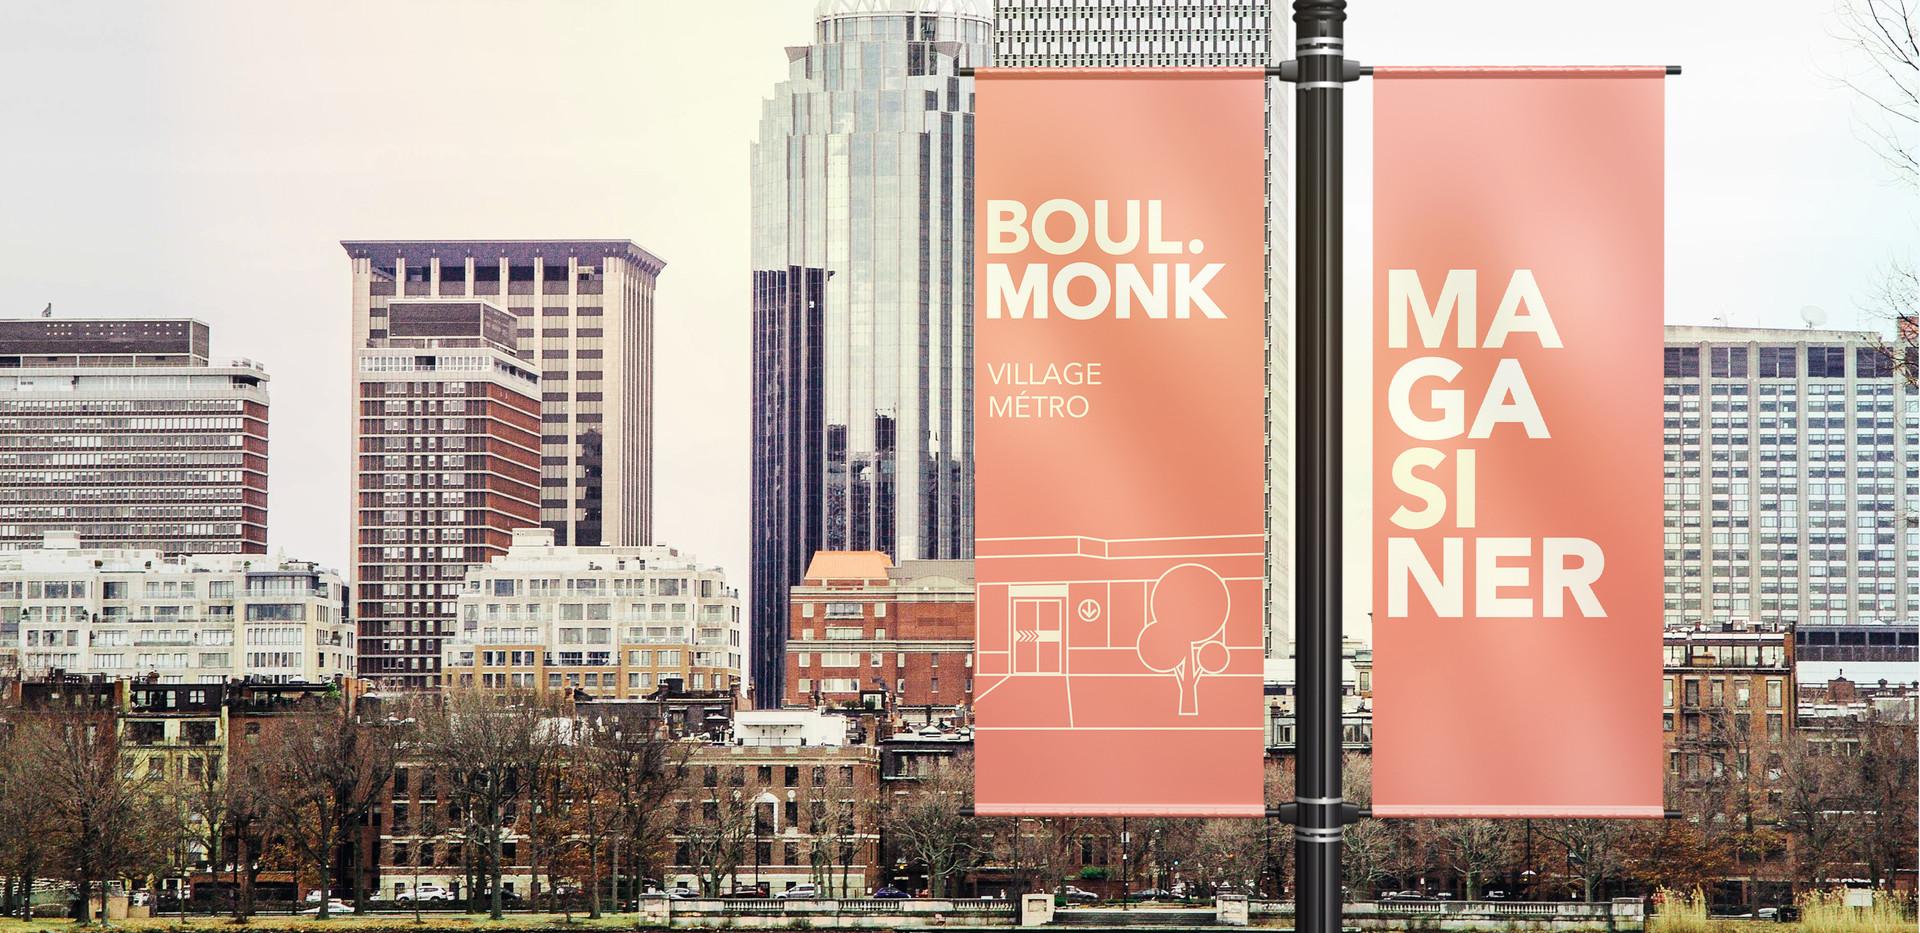 SDC Monk | Oriflamme_magasiner